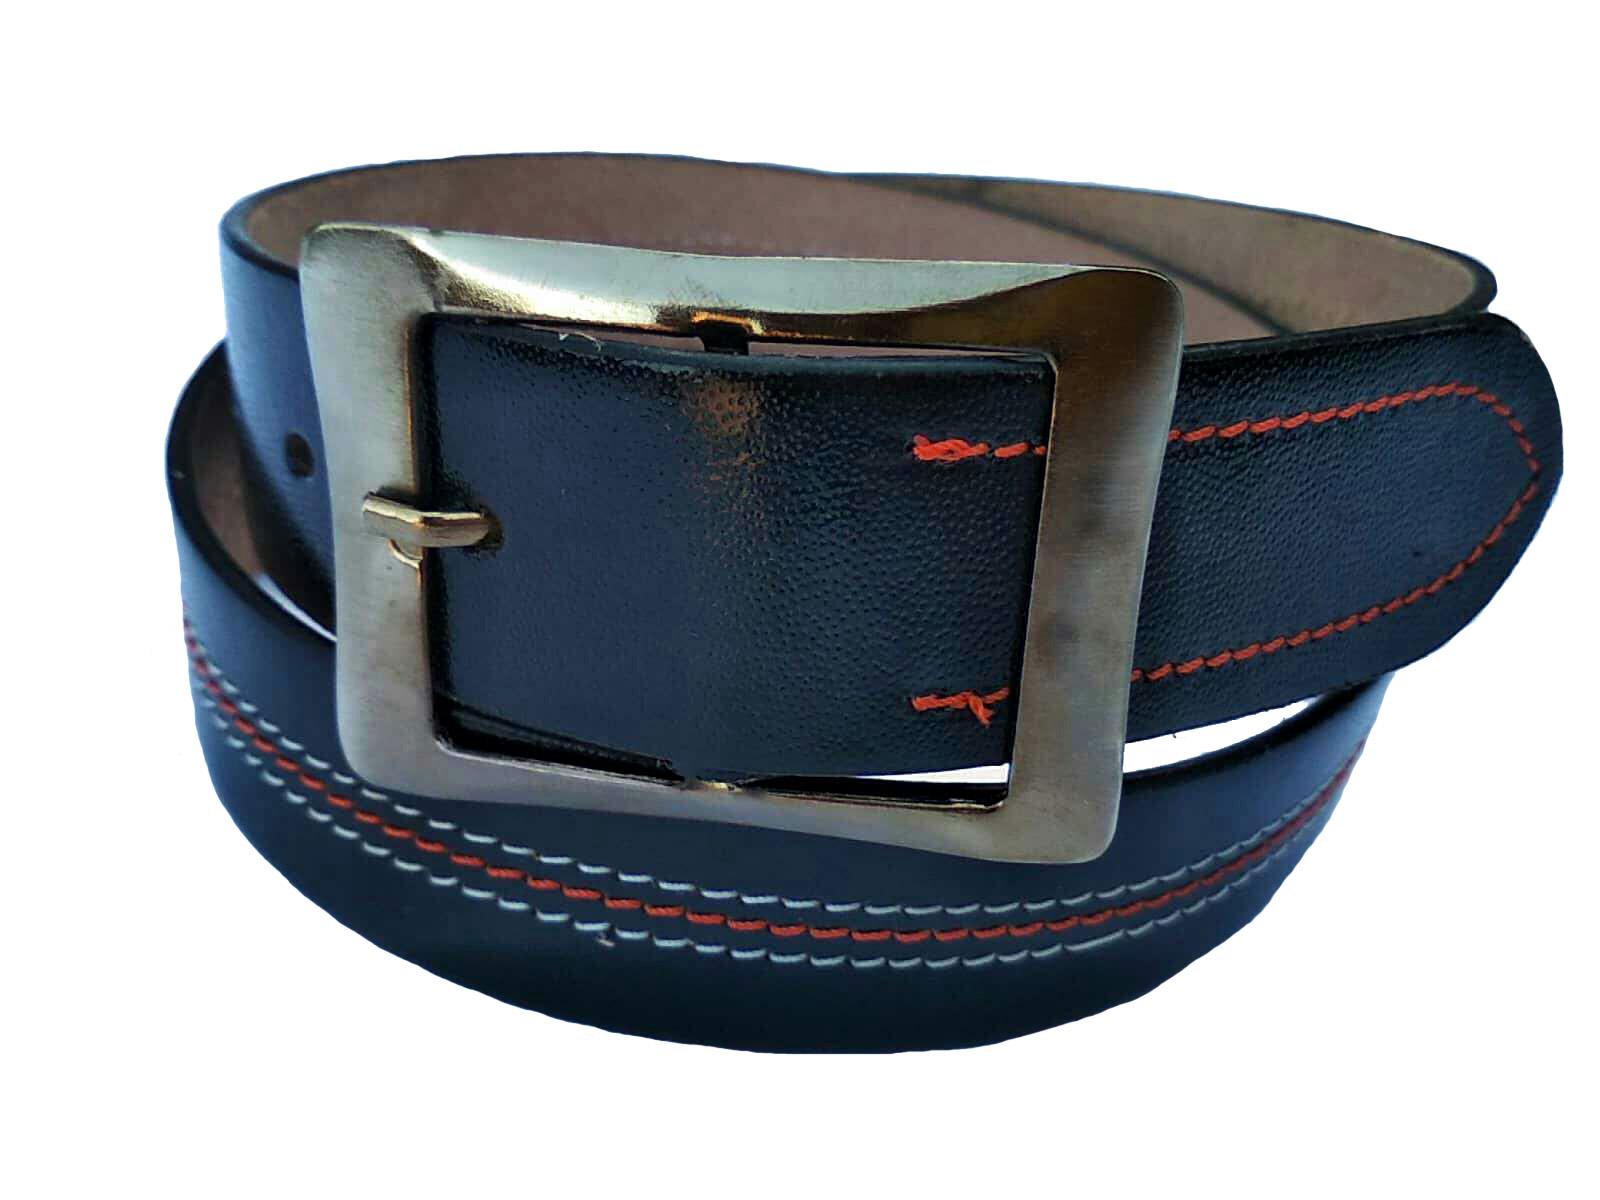 Forever99 Men's Leather Belts   Handmade Leather Belts leather belt for men formal branded #Black